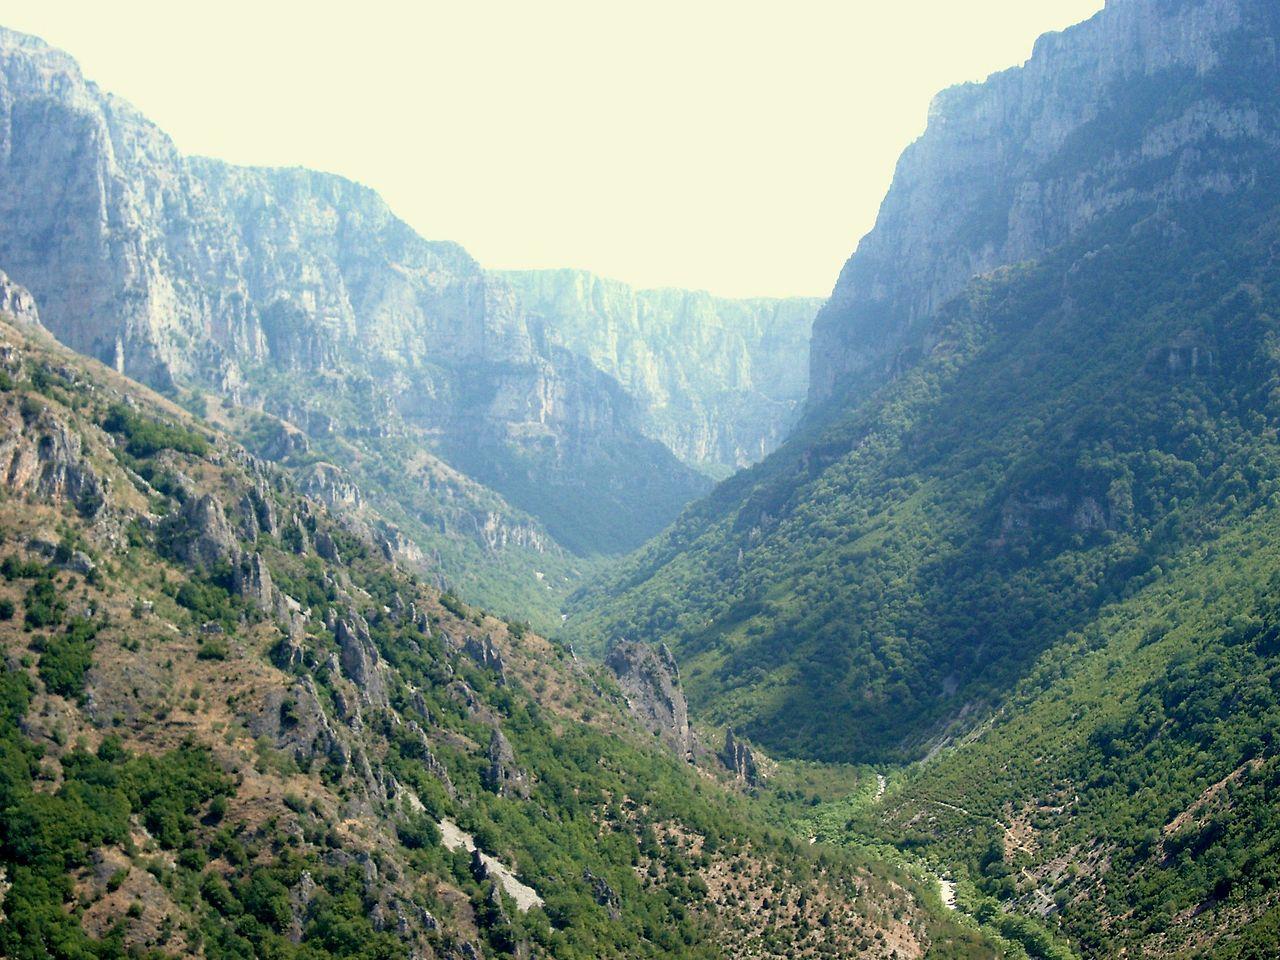 File:Vikos Gorge, Epirus, Greece 01.jpg - Wikimedia Commons